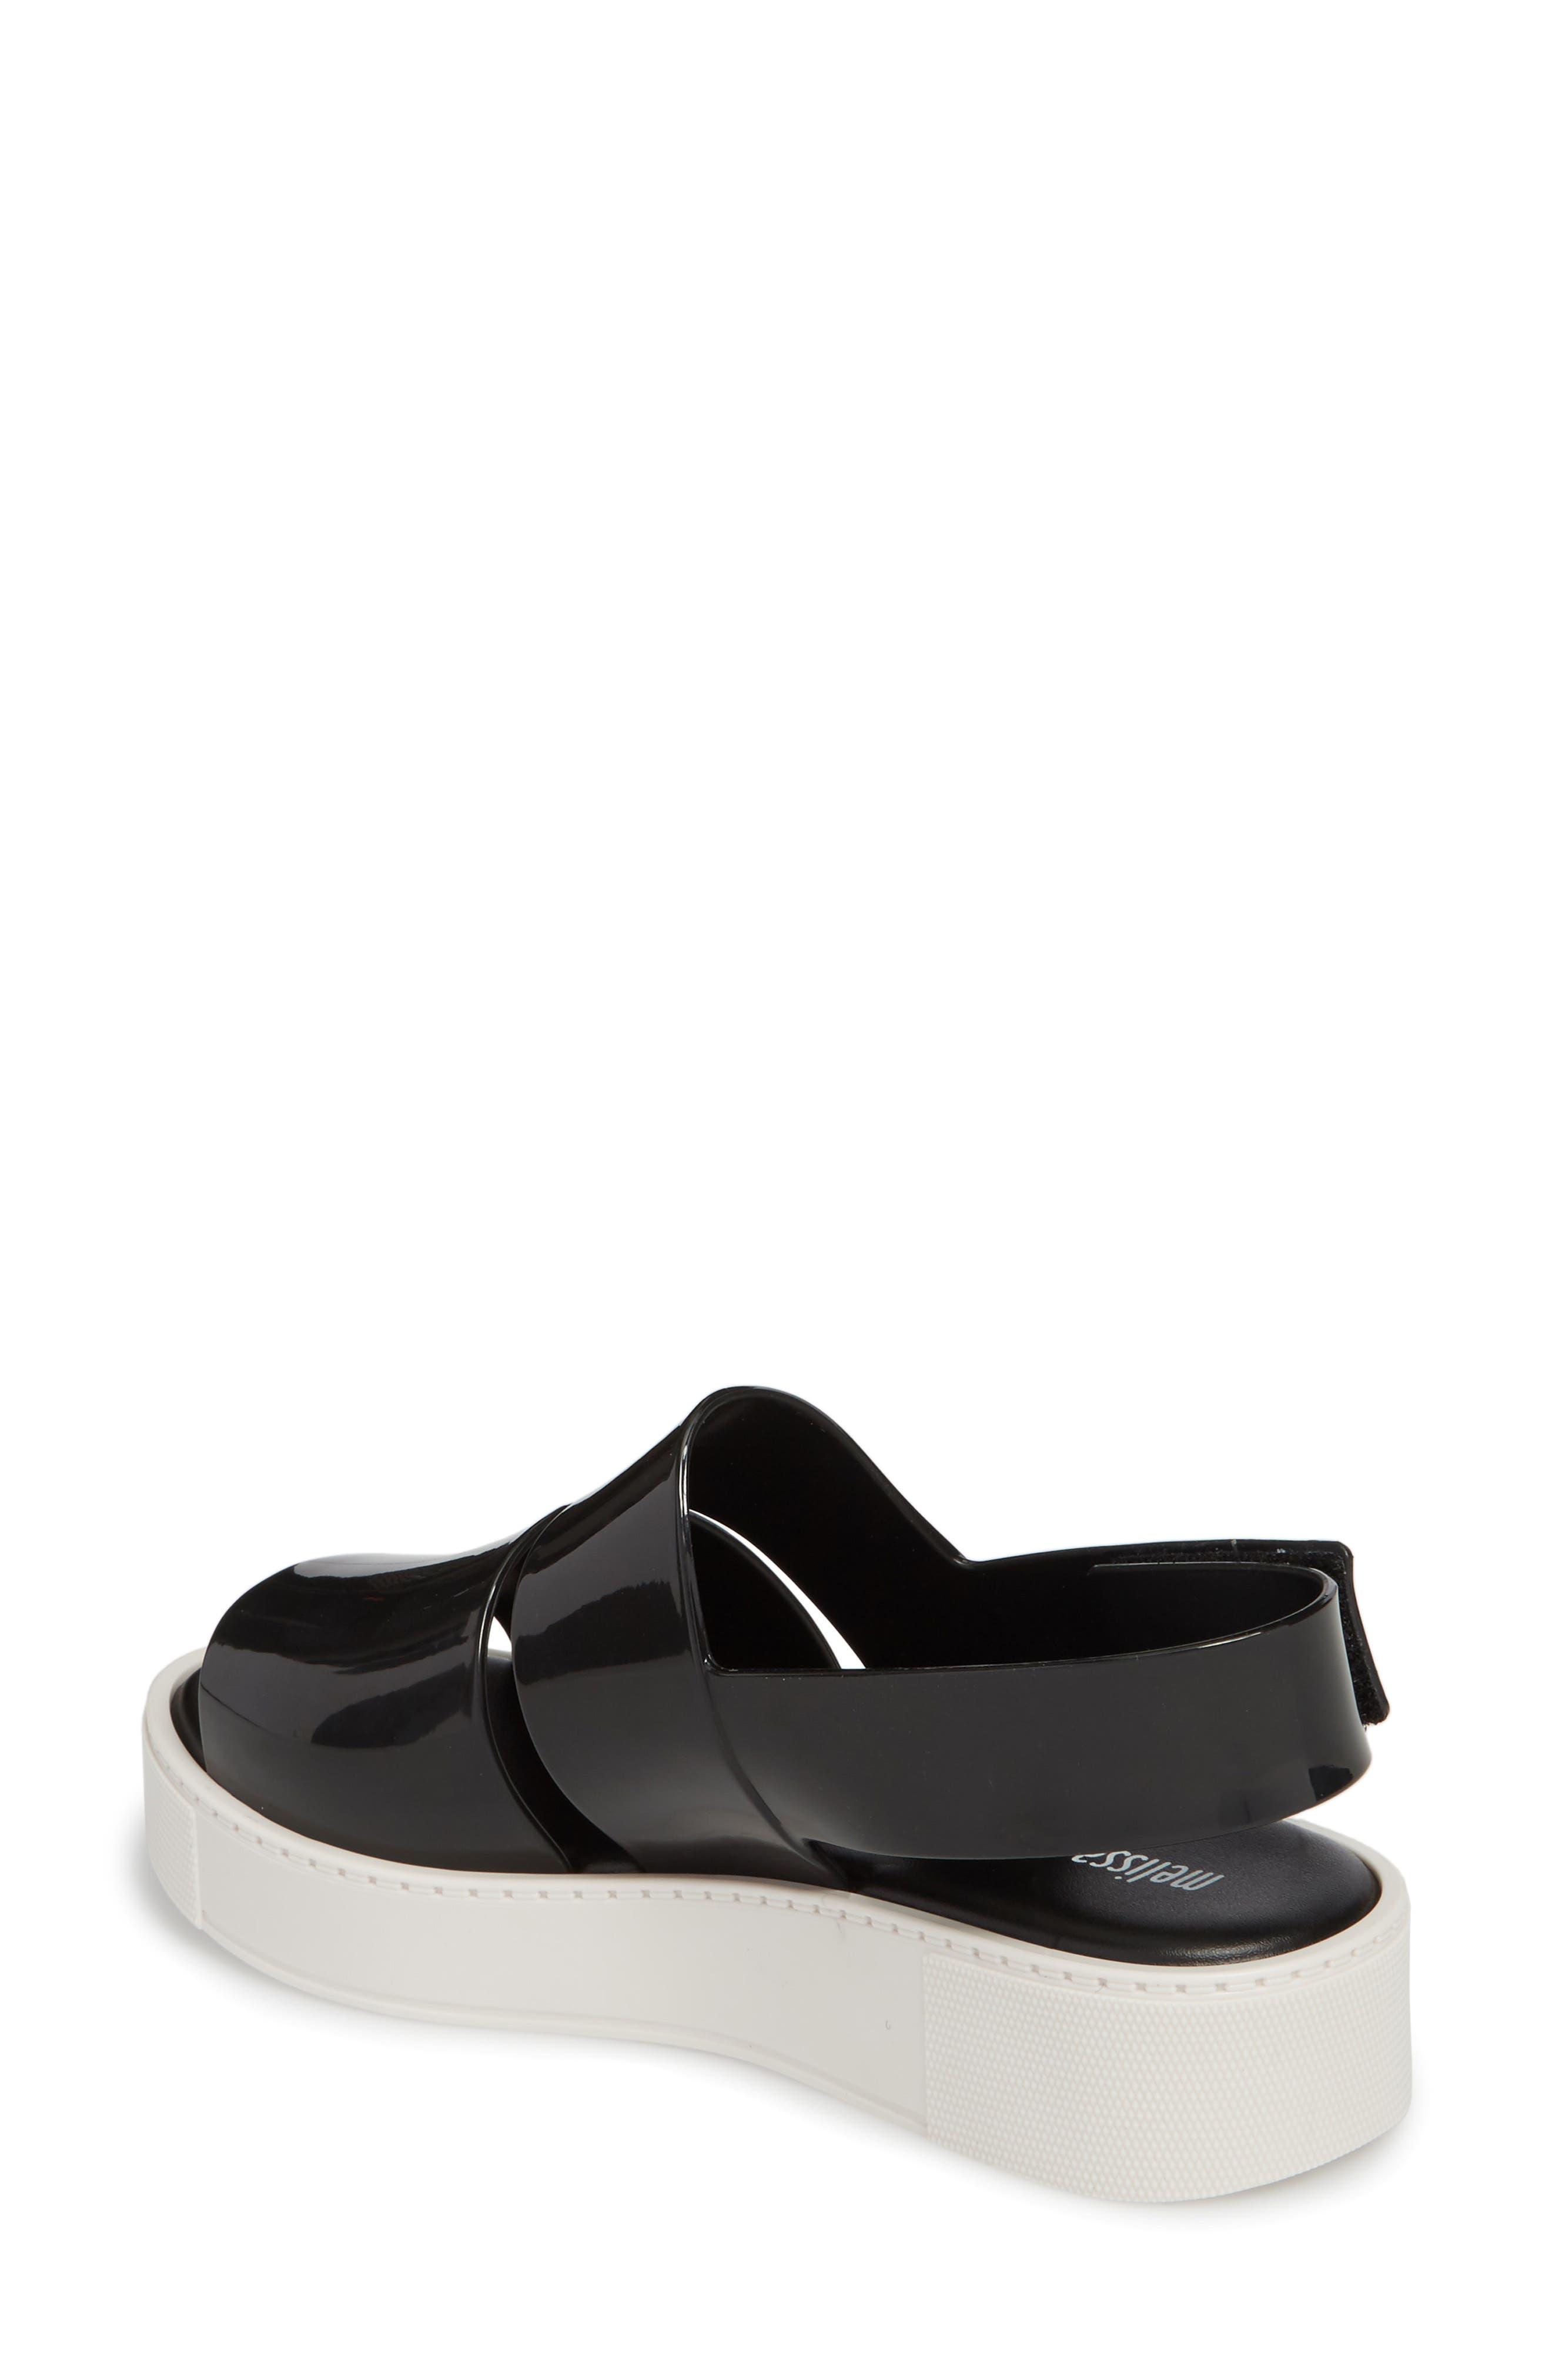 Soho Platform Sandal,                             Alternate thumbnail 2, color,                             001